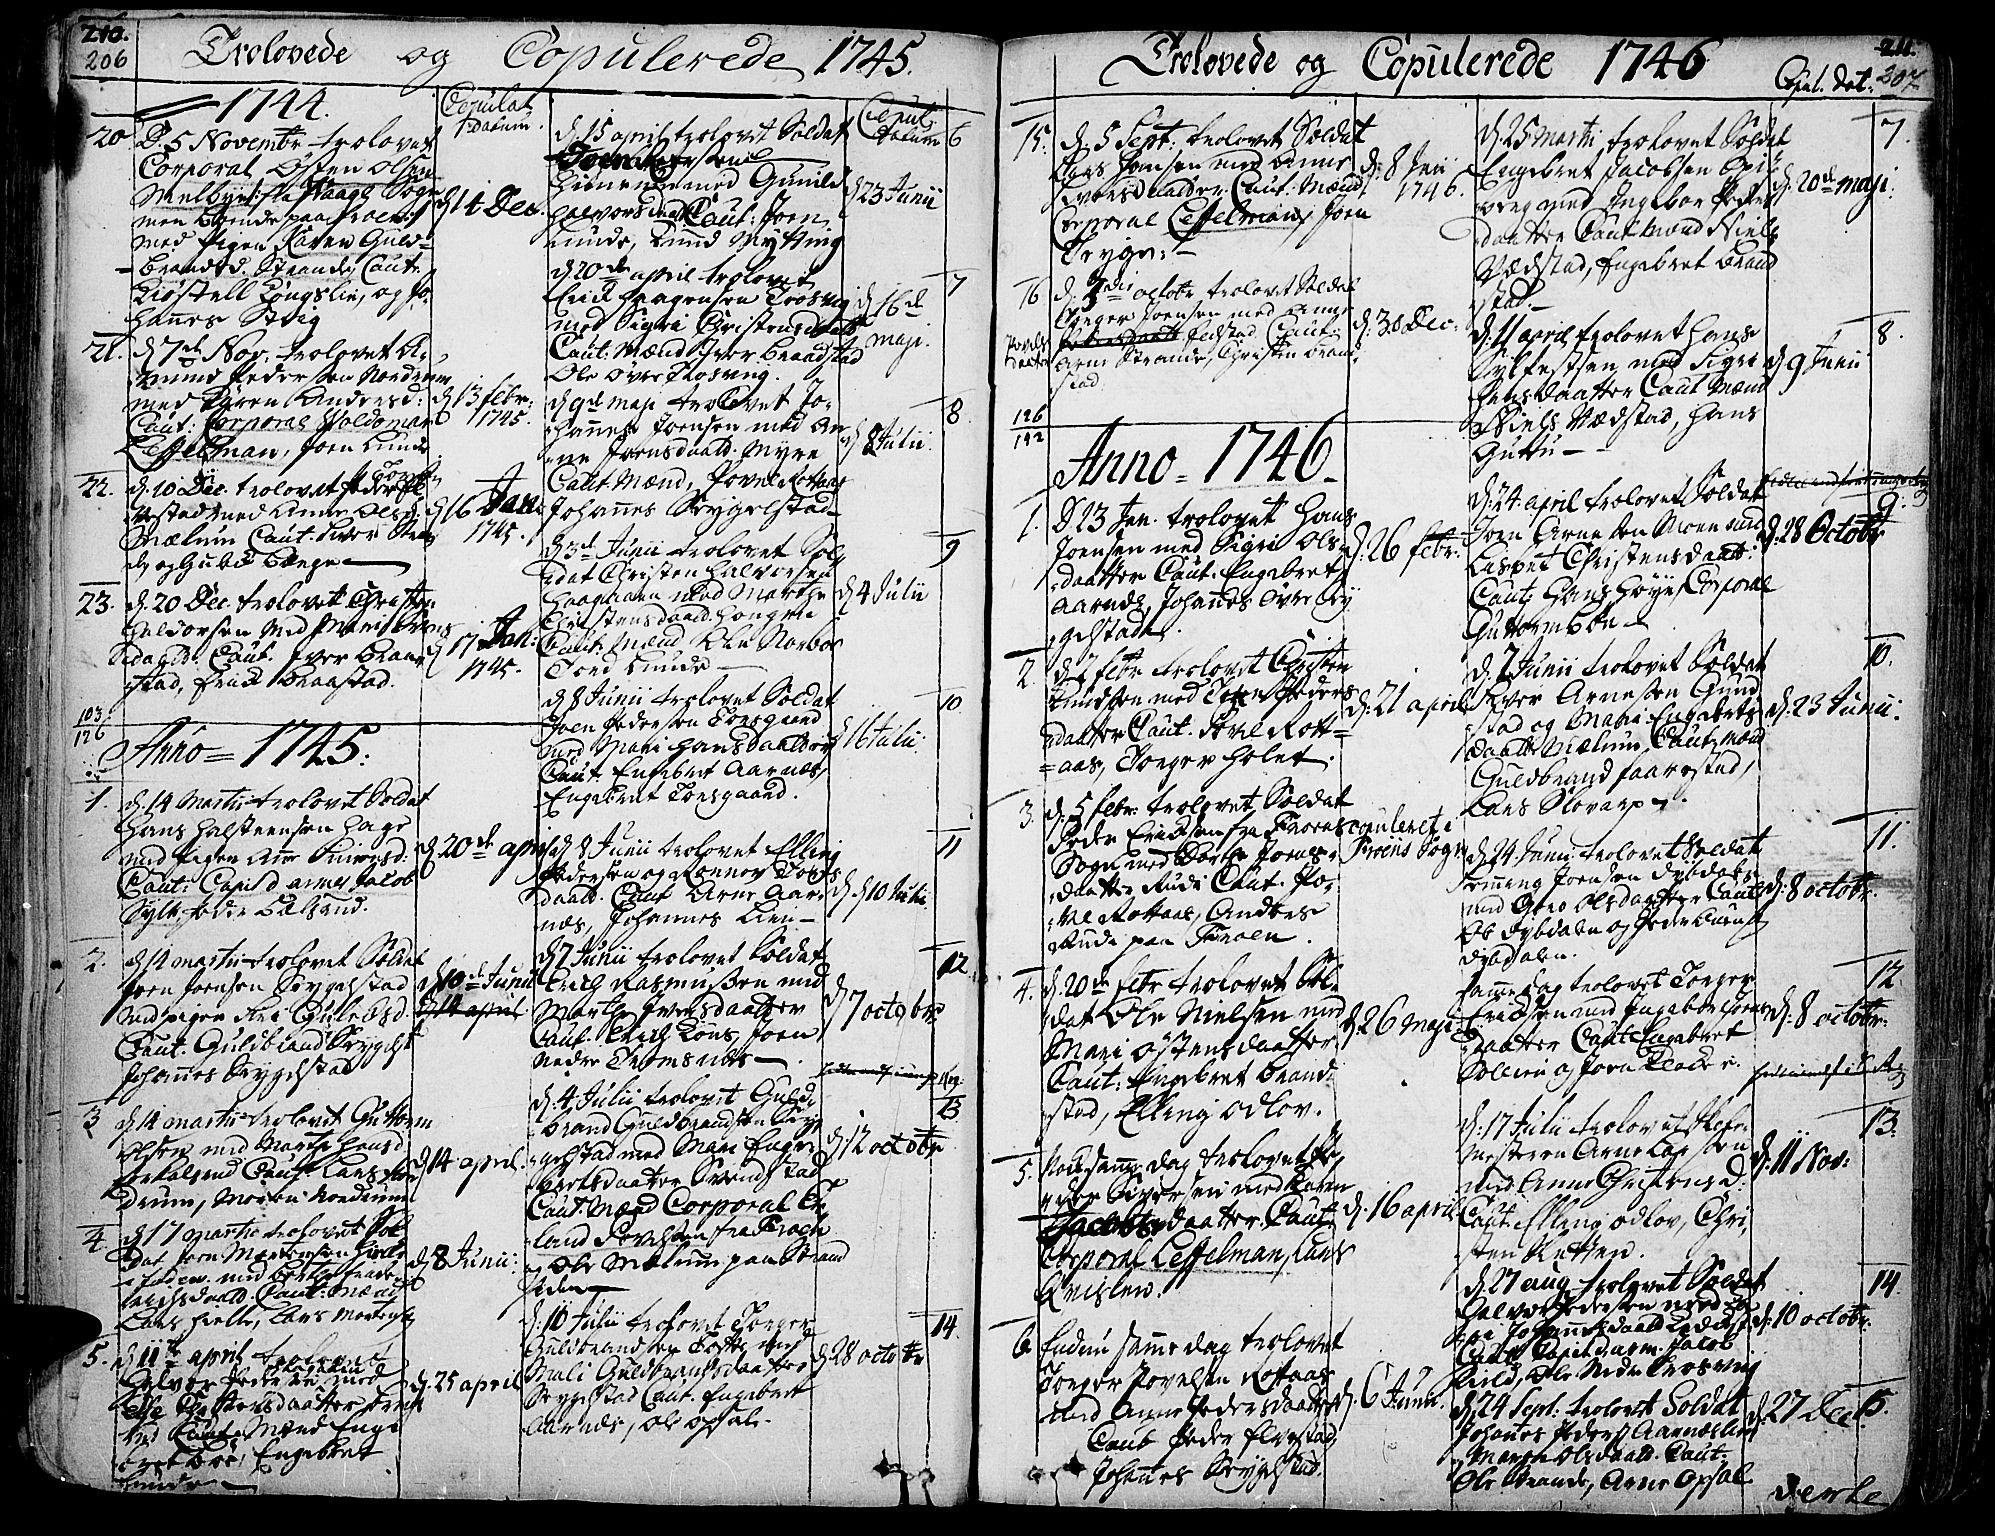 SAH, Ringebu prestekontor, Ministerialbok nr. 2, 1734-1780, s. 206-207